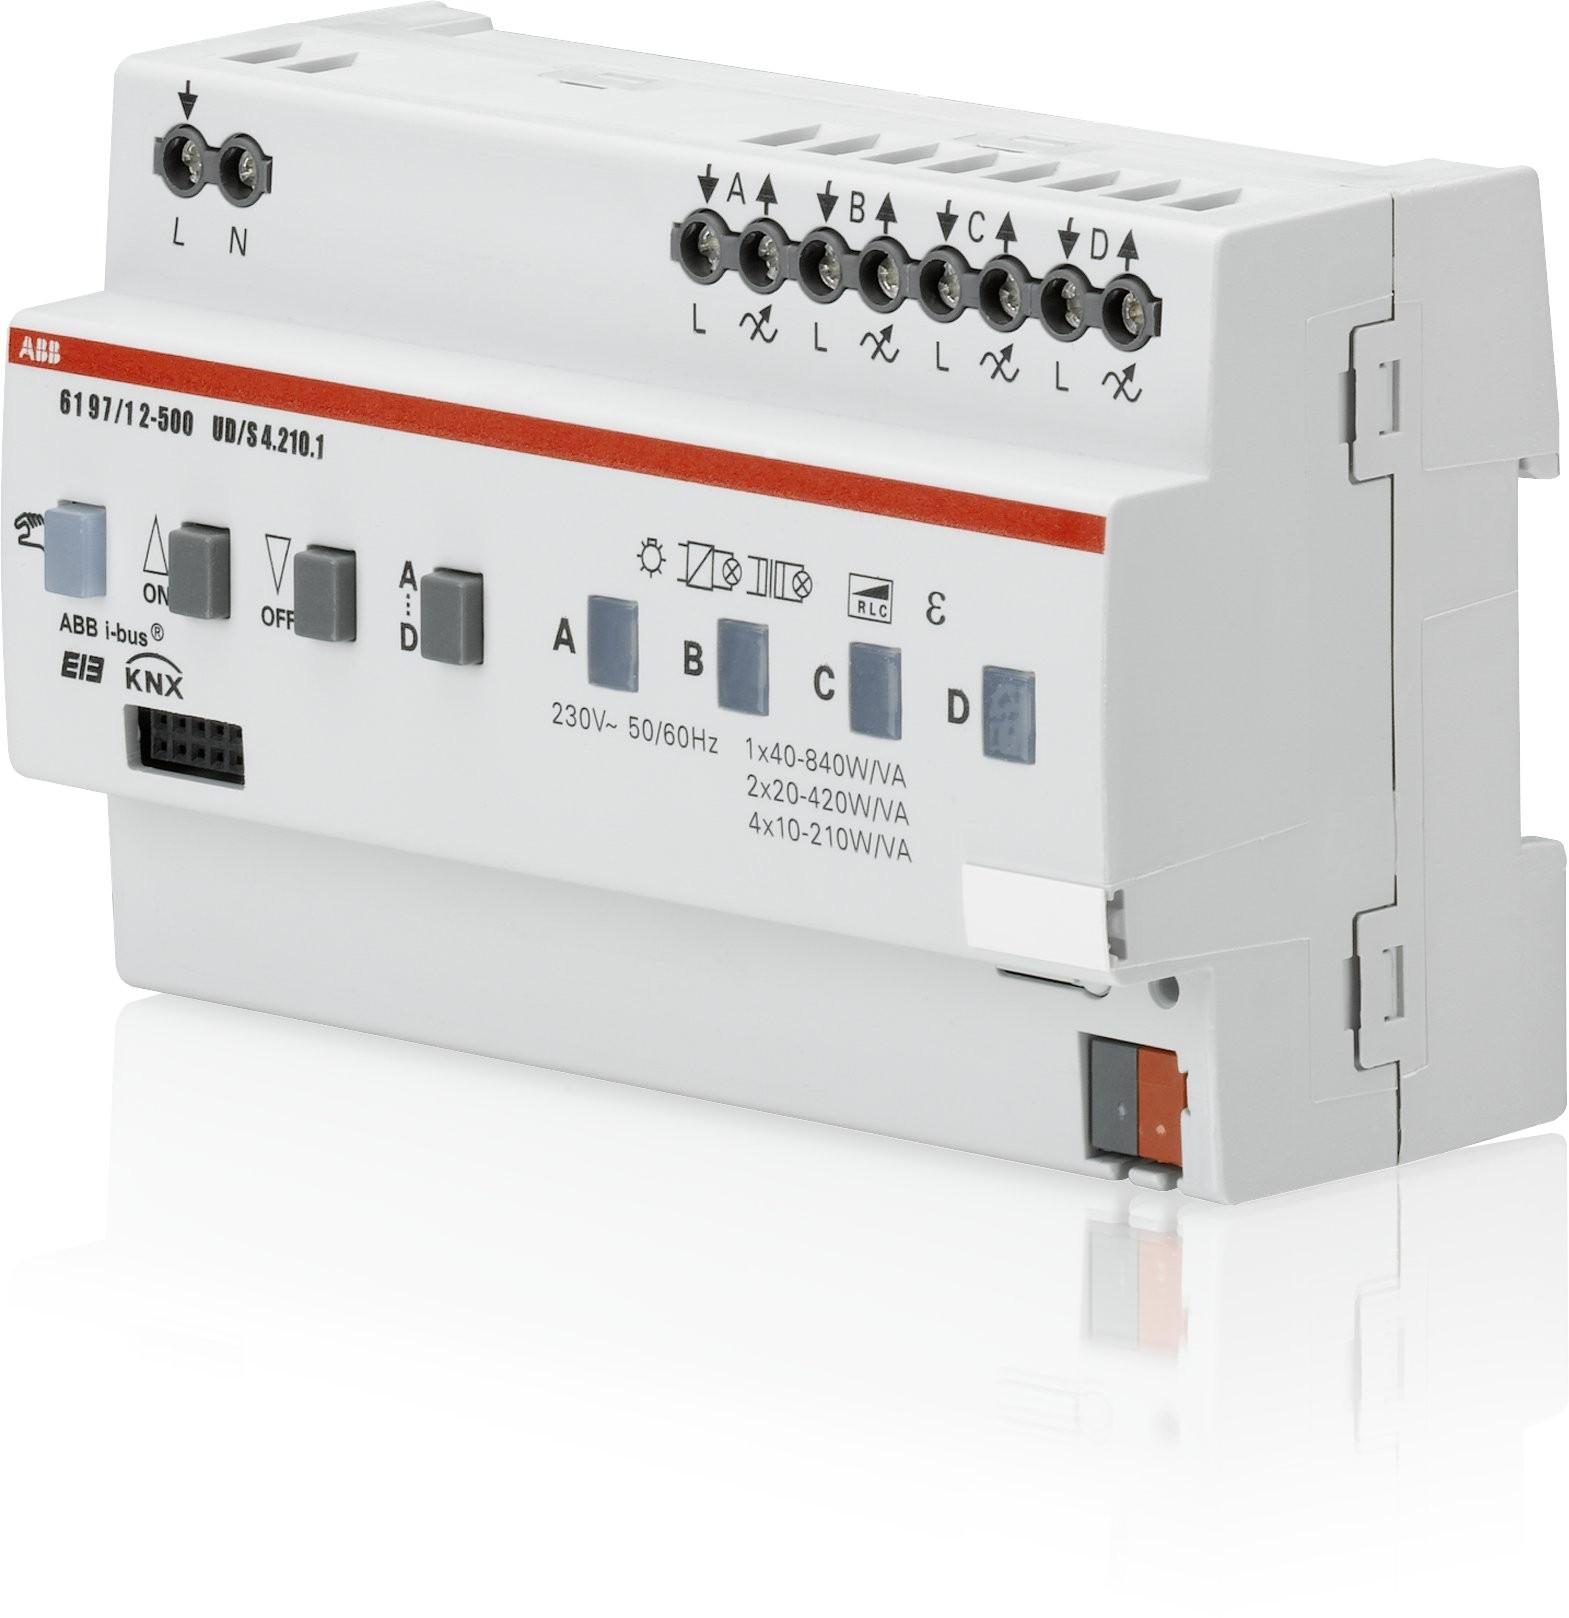 ABB Universal-Dimmaktor UD/S 4.210.1 2 2CDG006197R0025